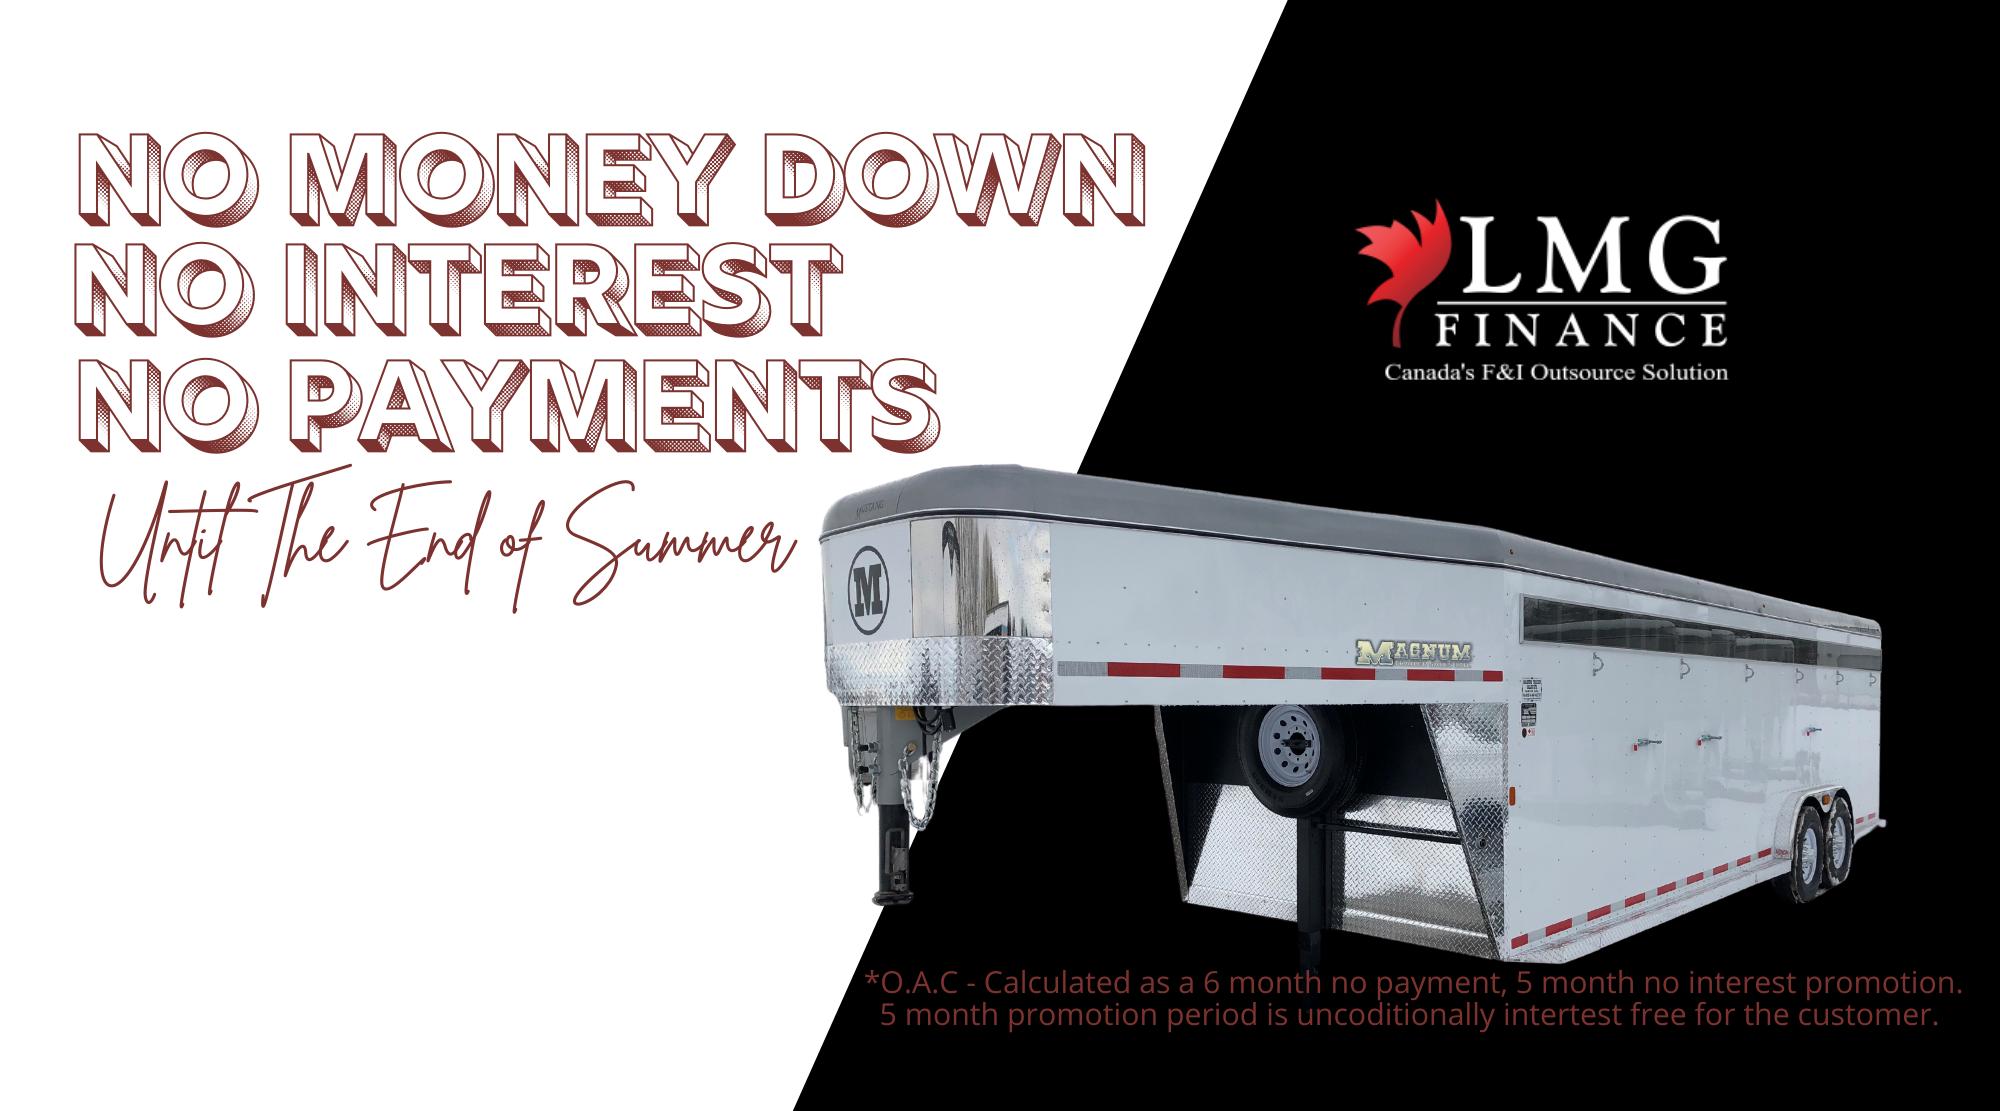 LMG Finance Slide Show Advertisement (3)